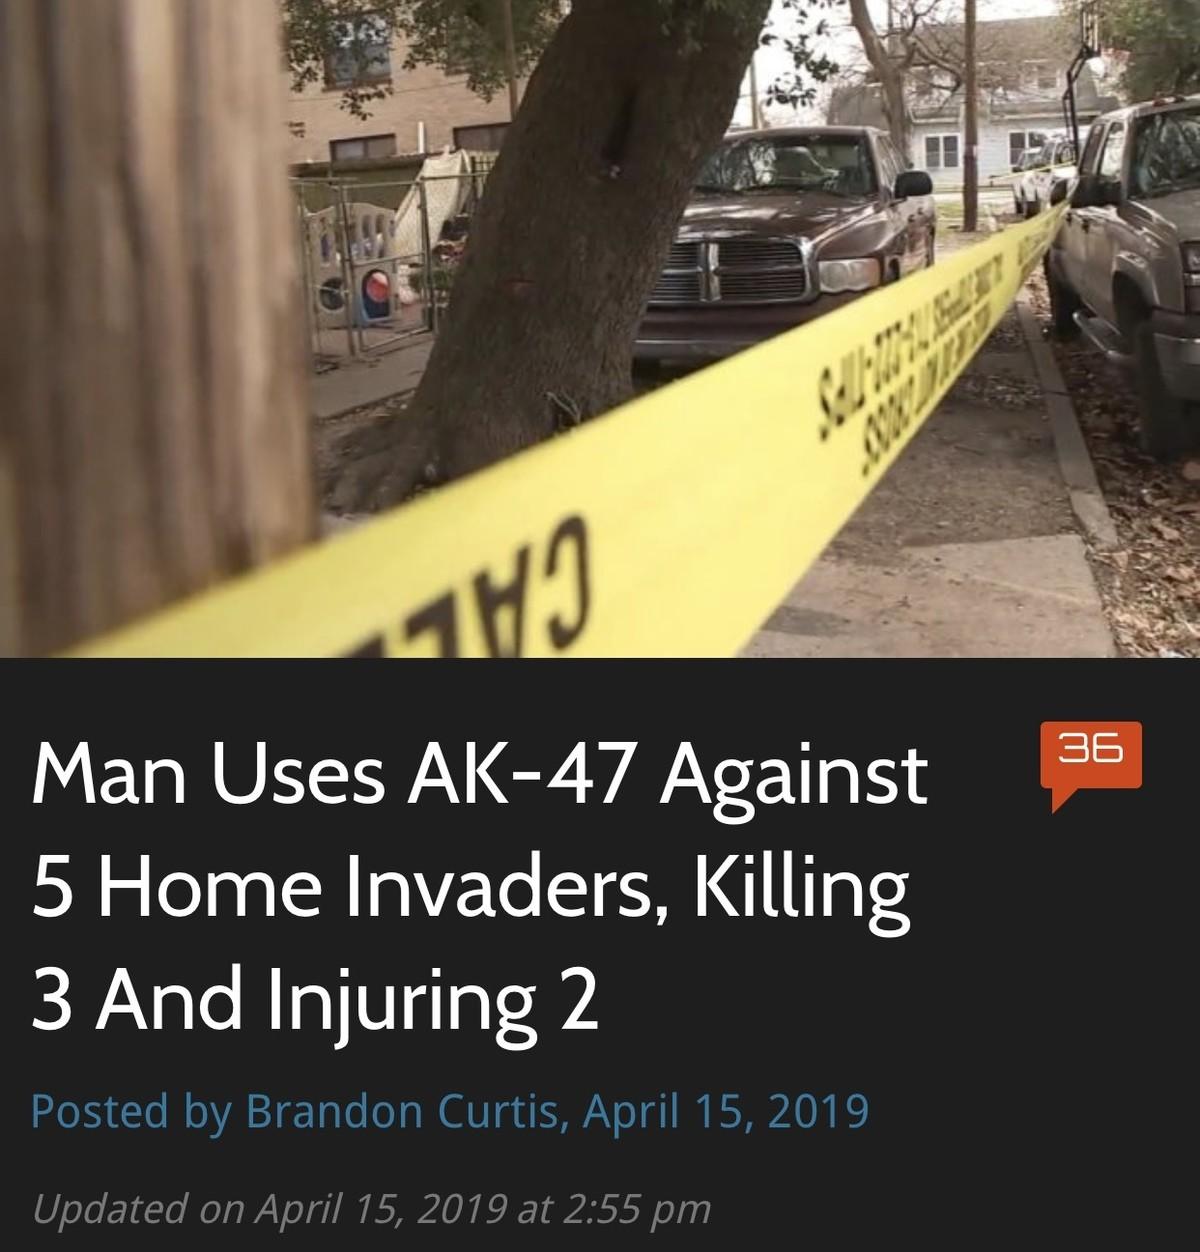 Guns save lives. .. 3/5 aint bad, shame he wasnt a better shot